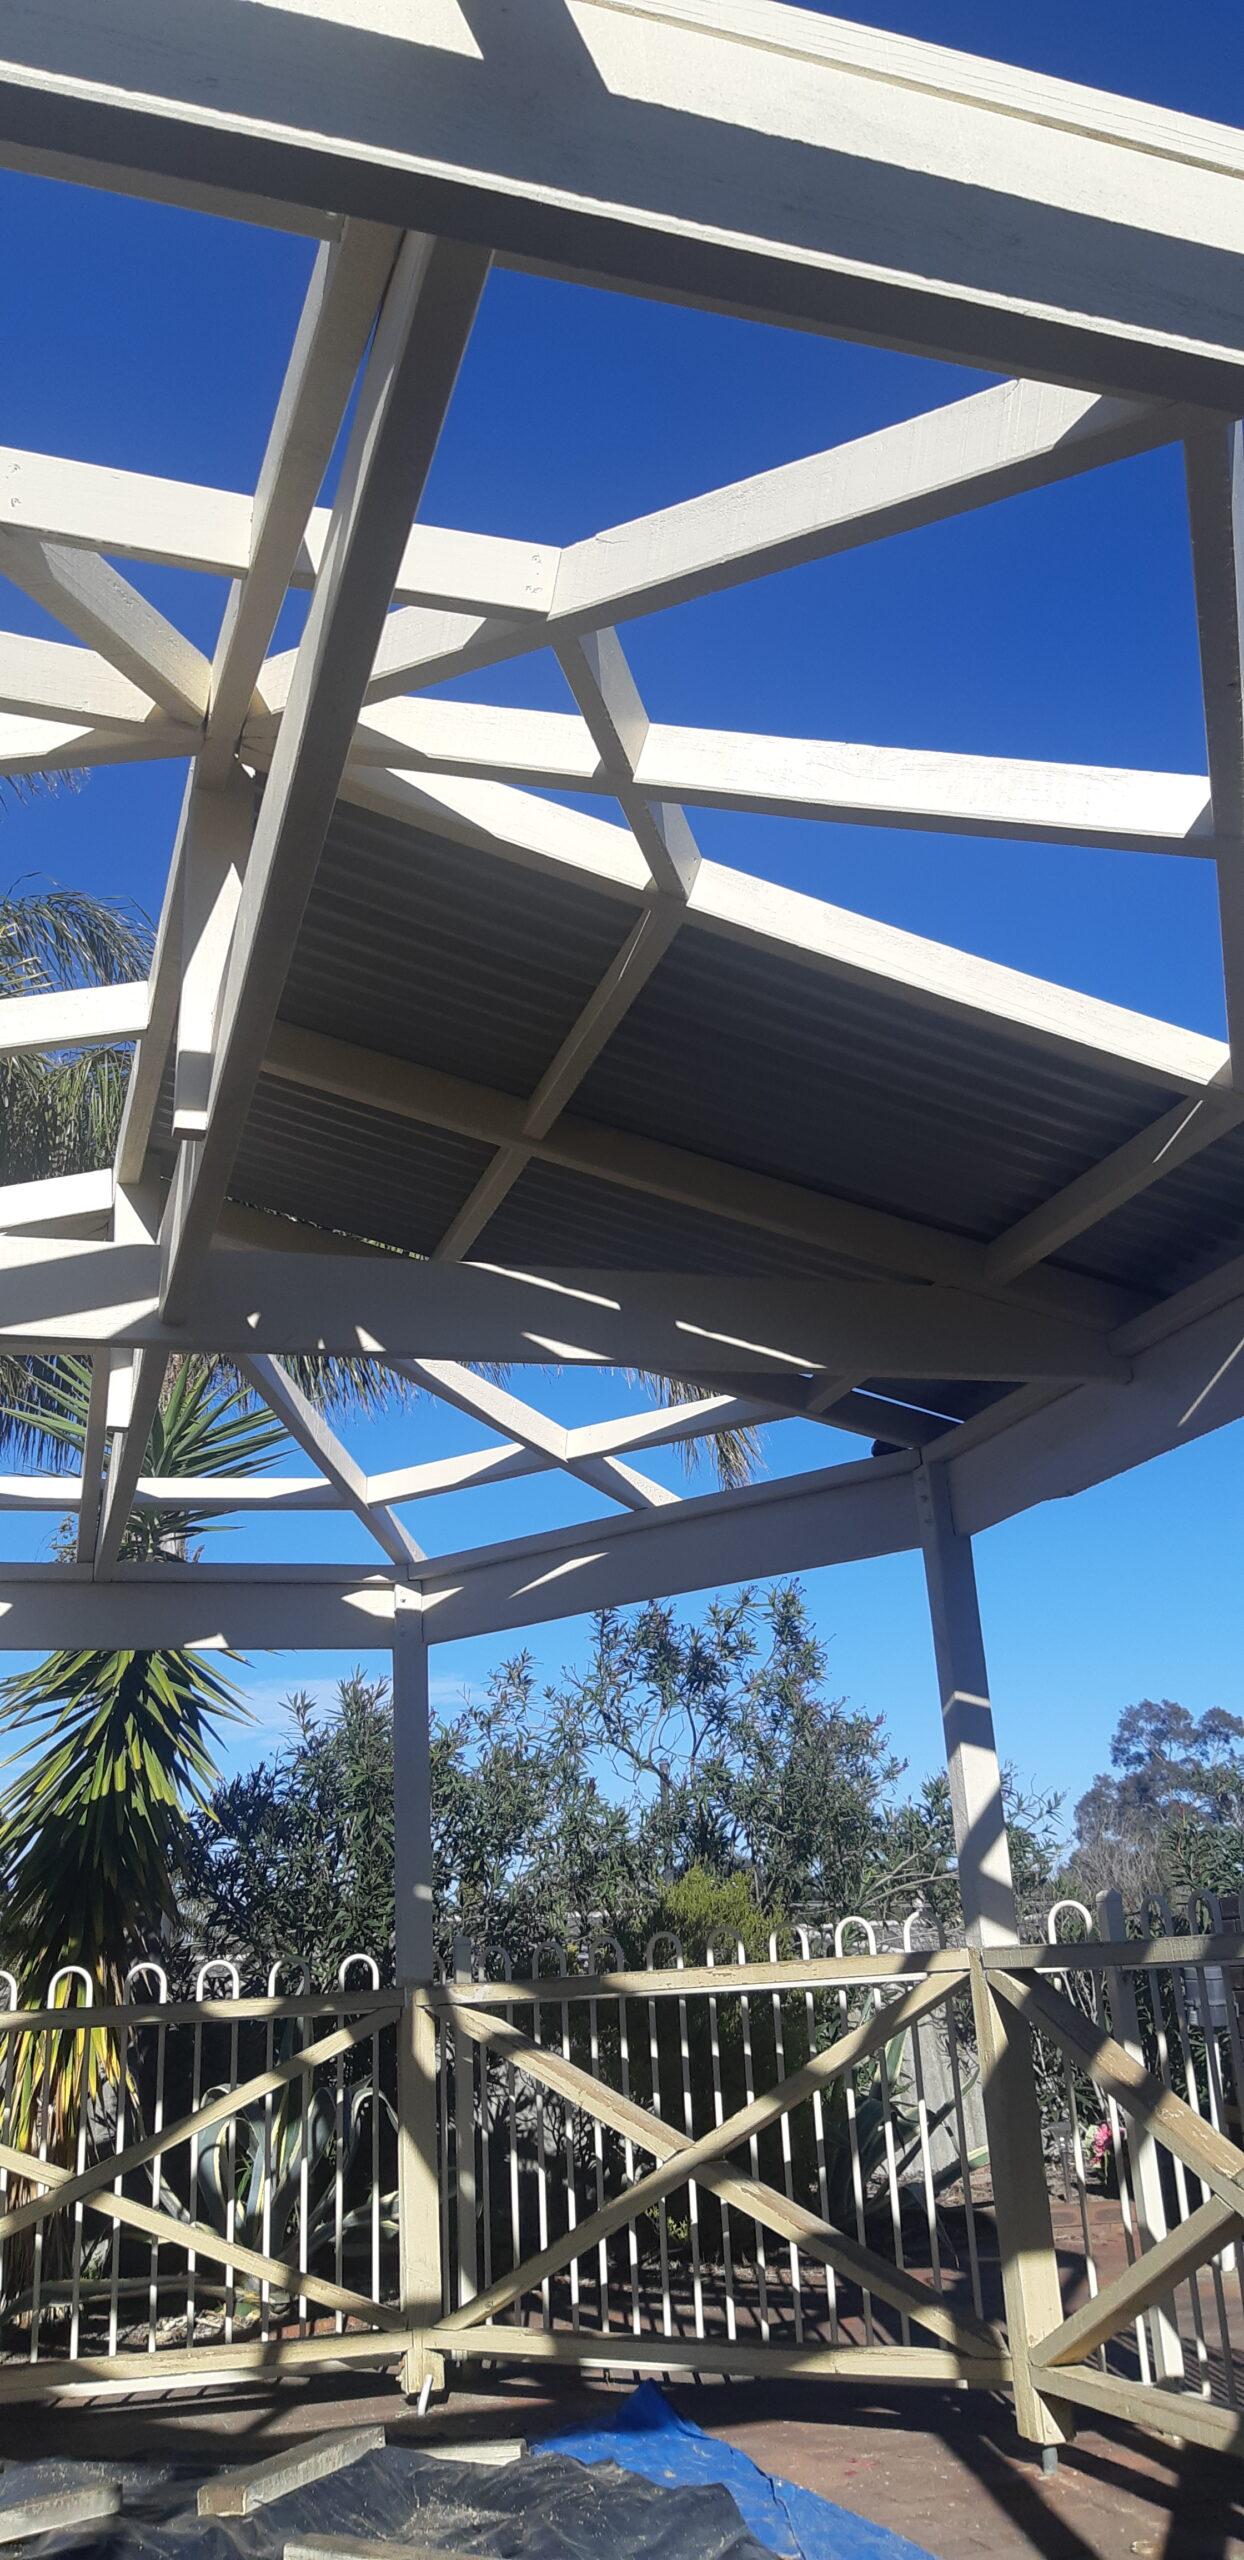 Installation of Gazebo roof